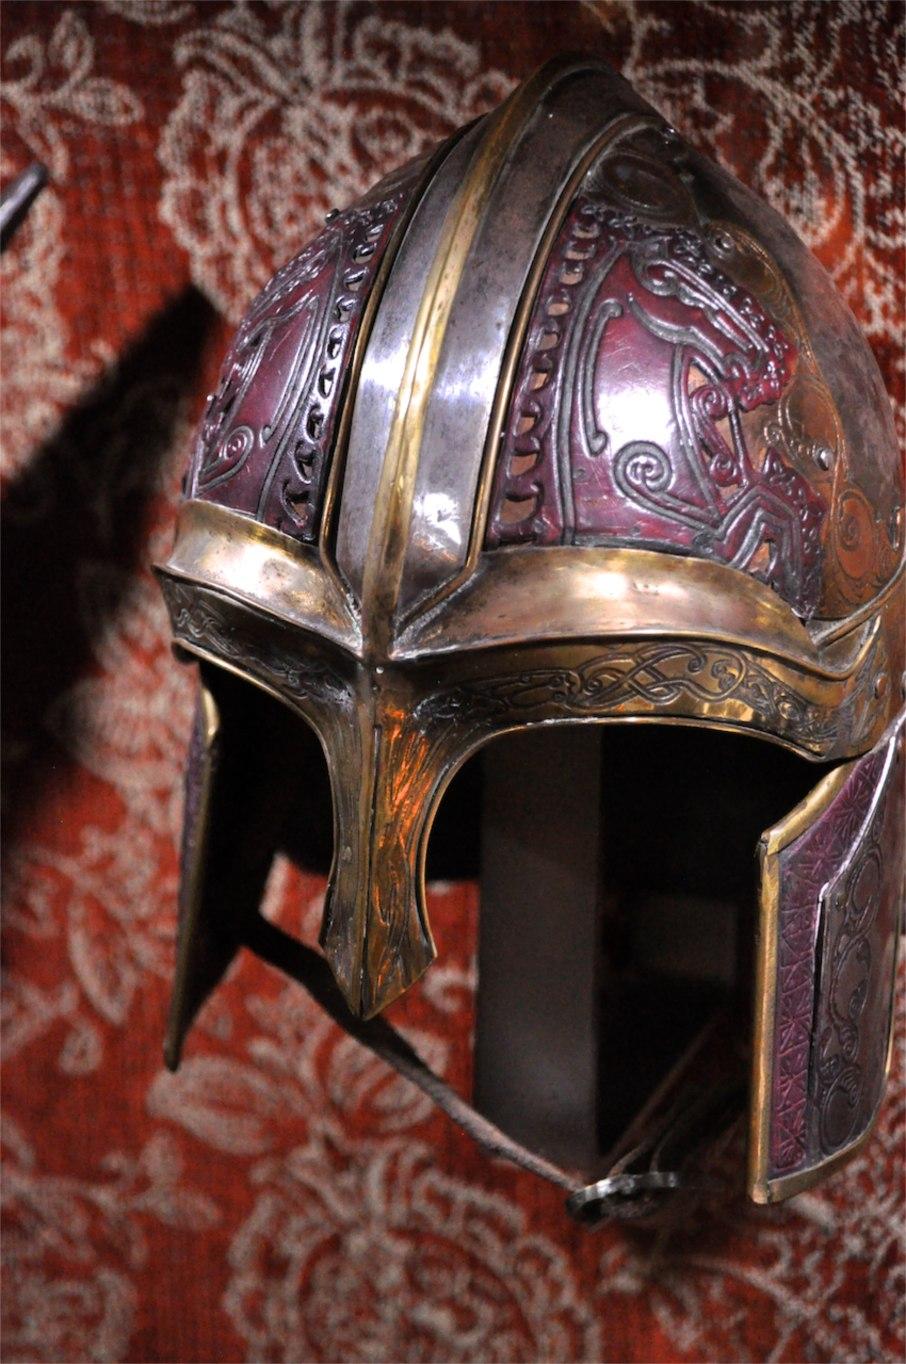 LOTR - HL Rings, Hobbit-scale Rohan Helmet